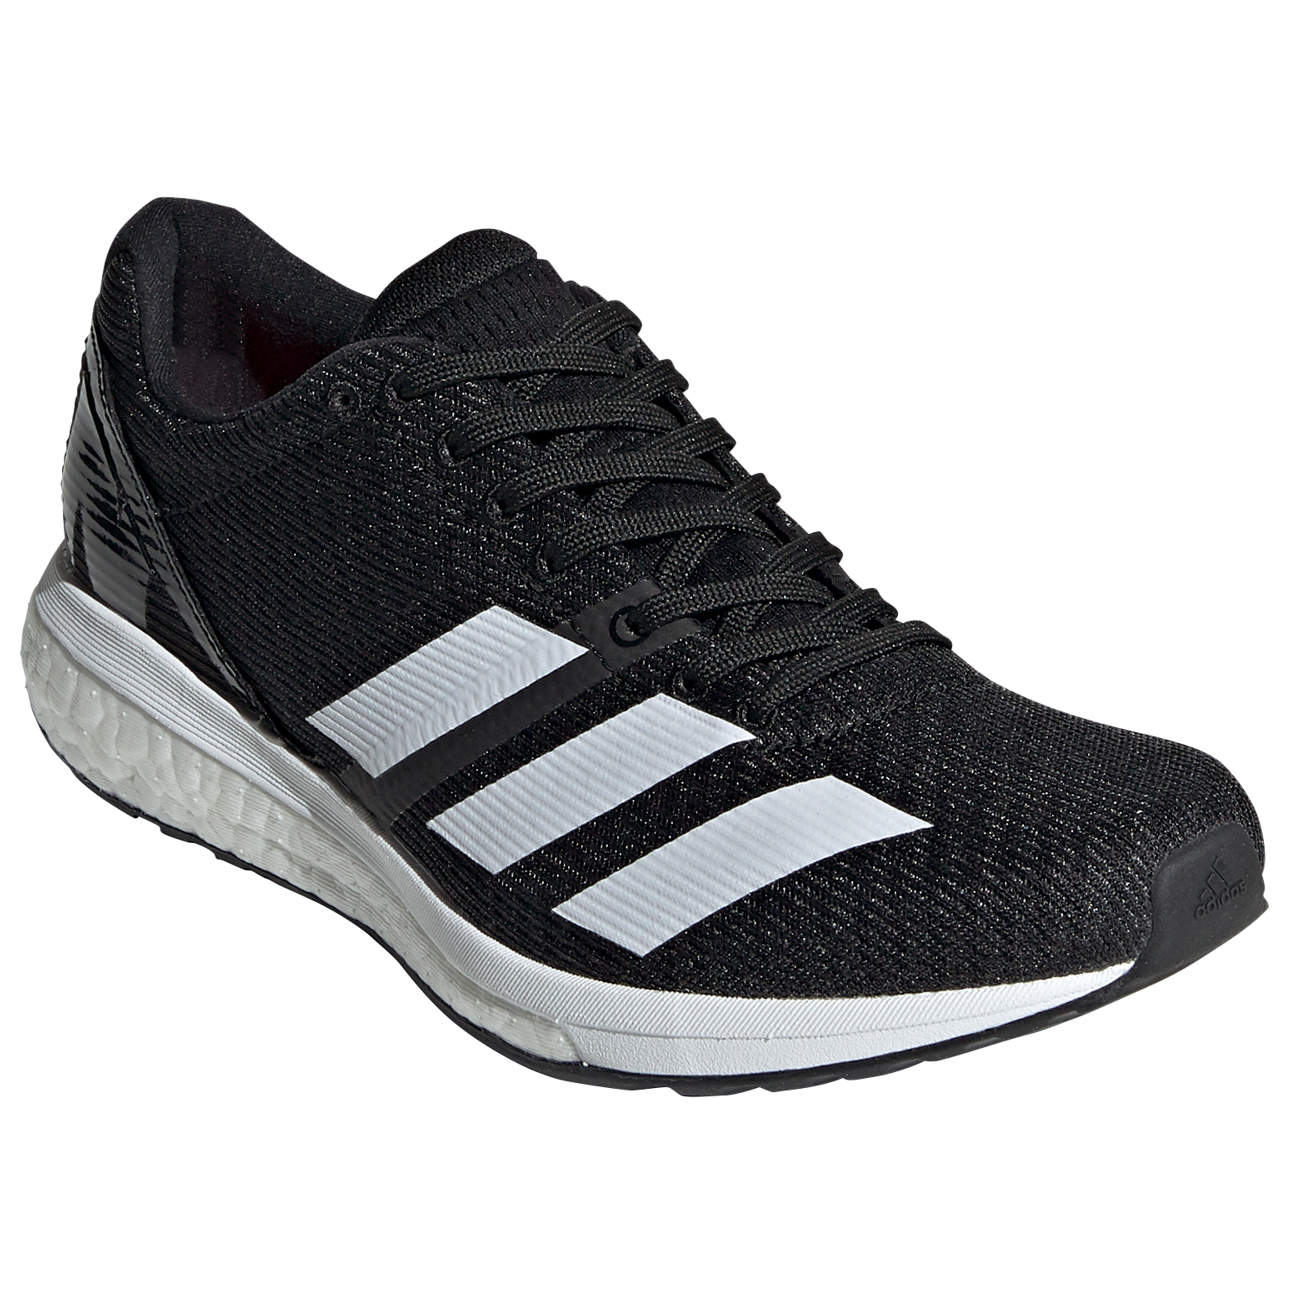 Adidas AdiZero Boston 8 Runningschoenen Dames online kopen